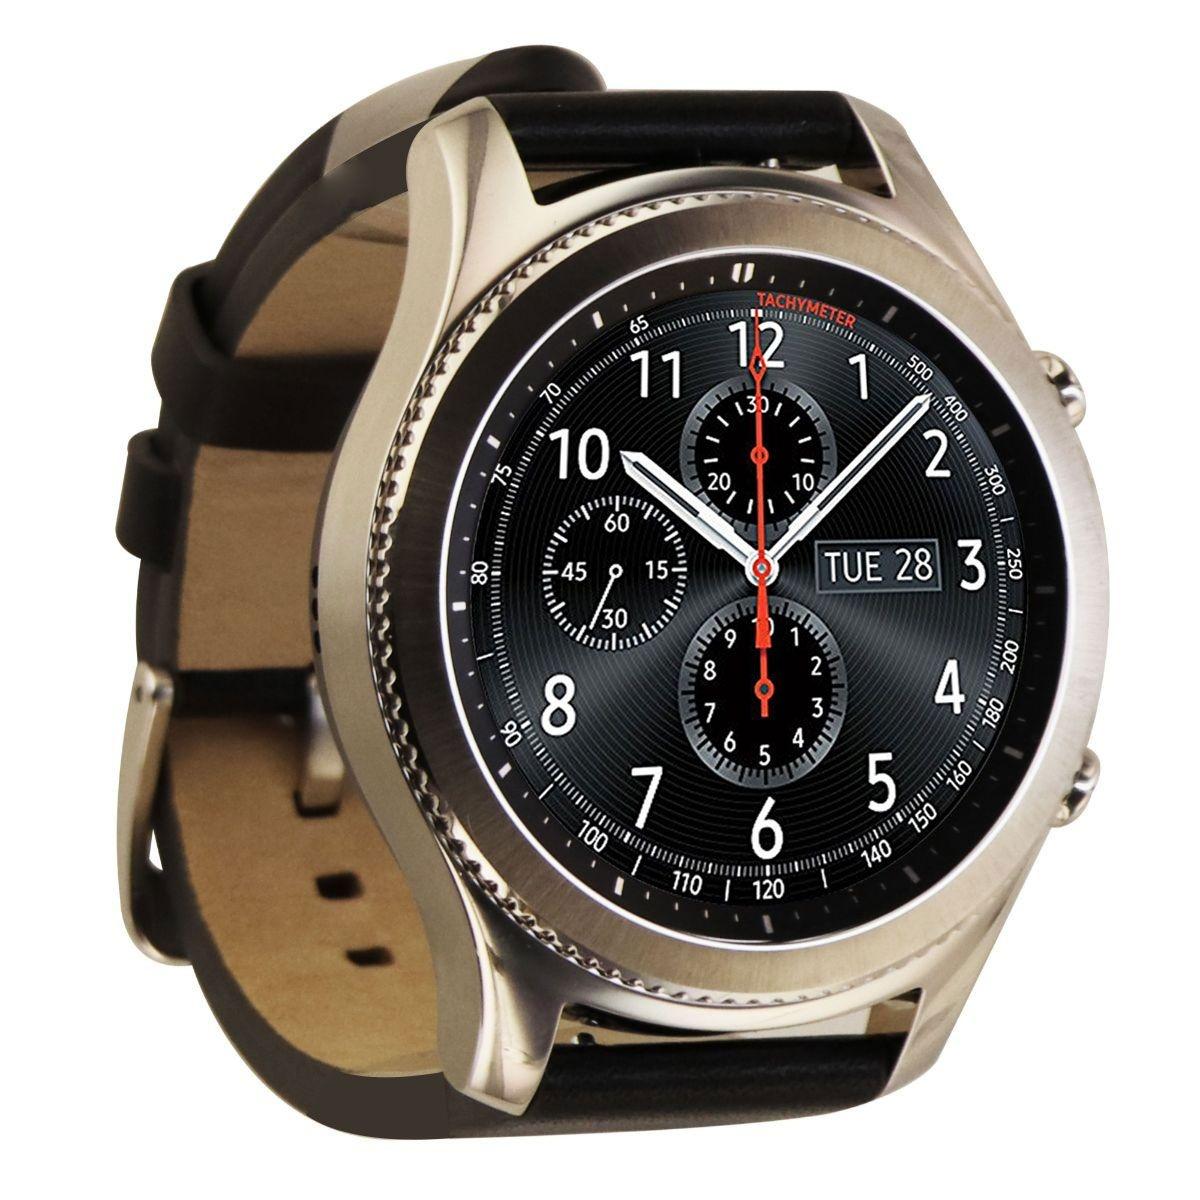 Samsung Gear S3 Classic Smartwatch SM-R775V Unlocked -Silver w/ BLK Leather Band